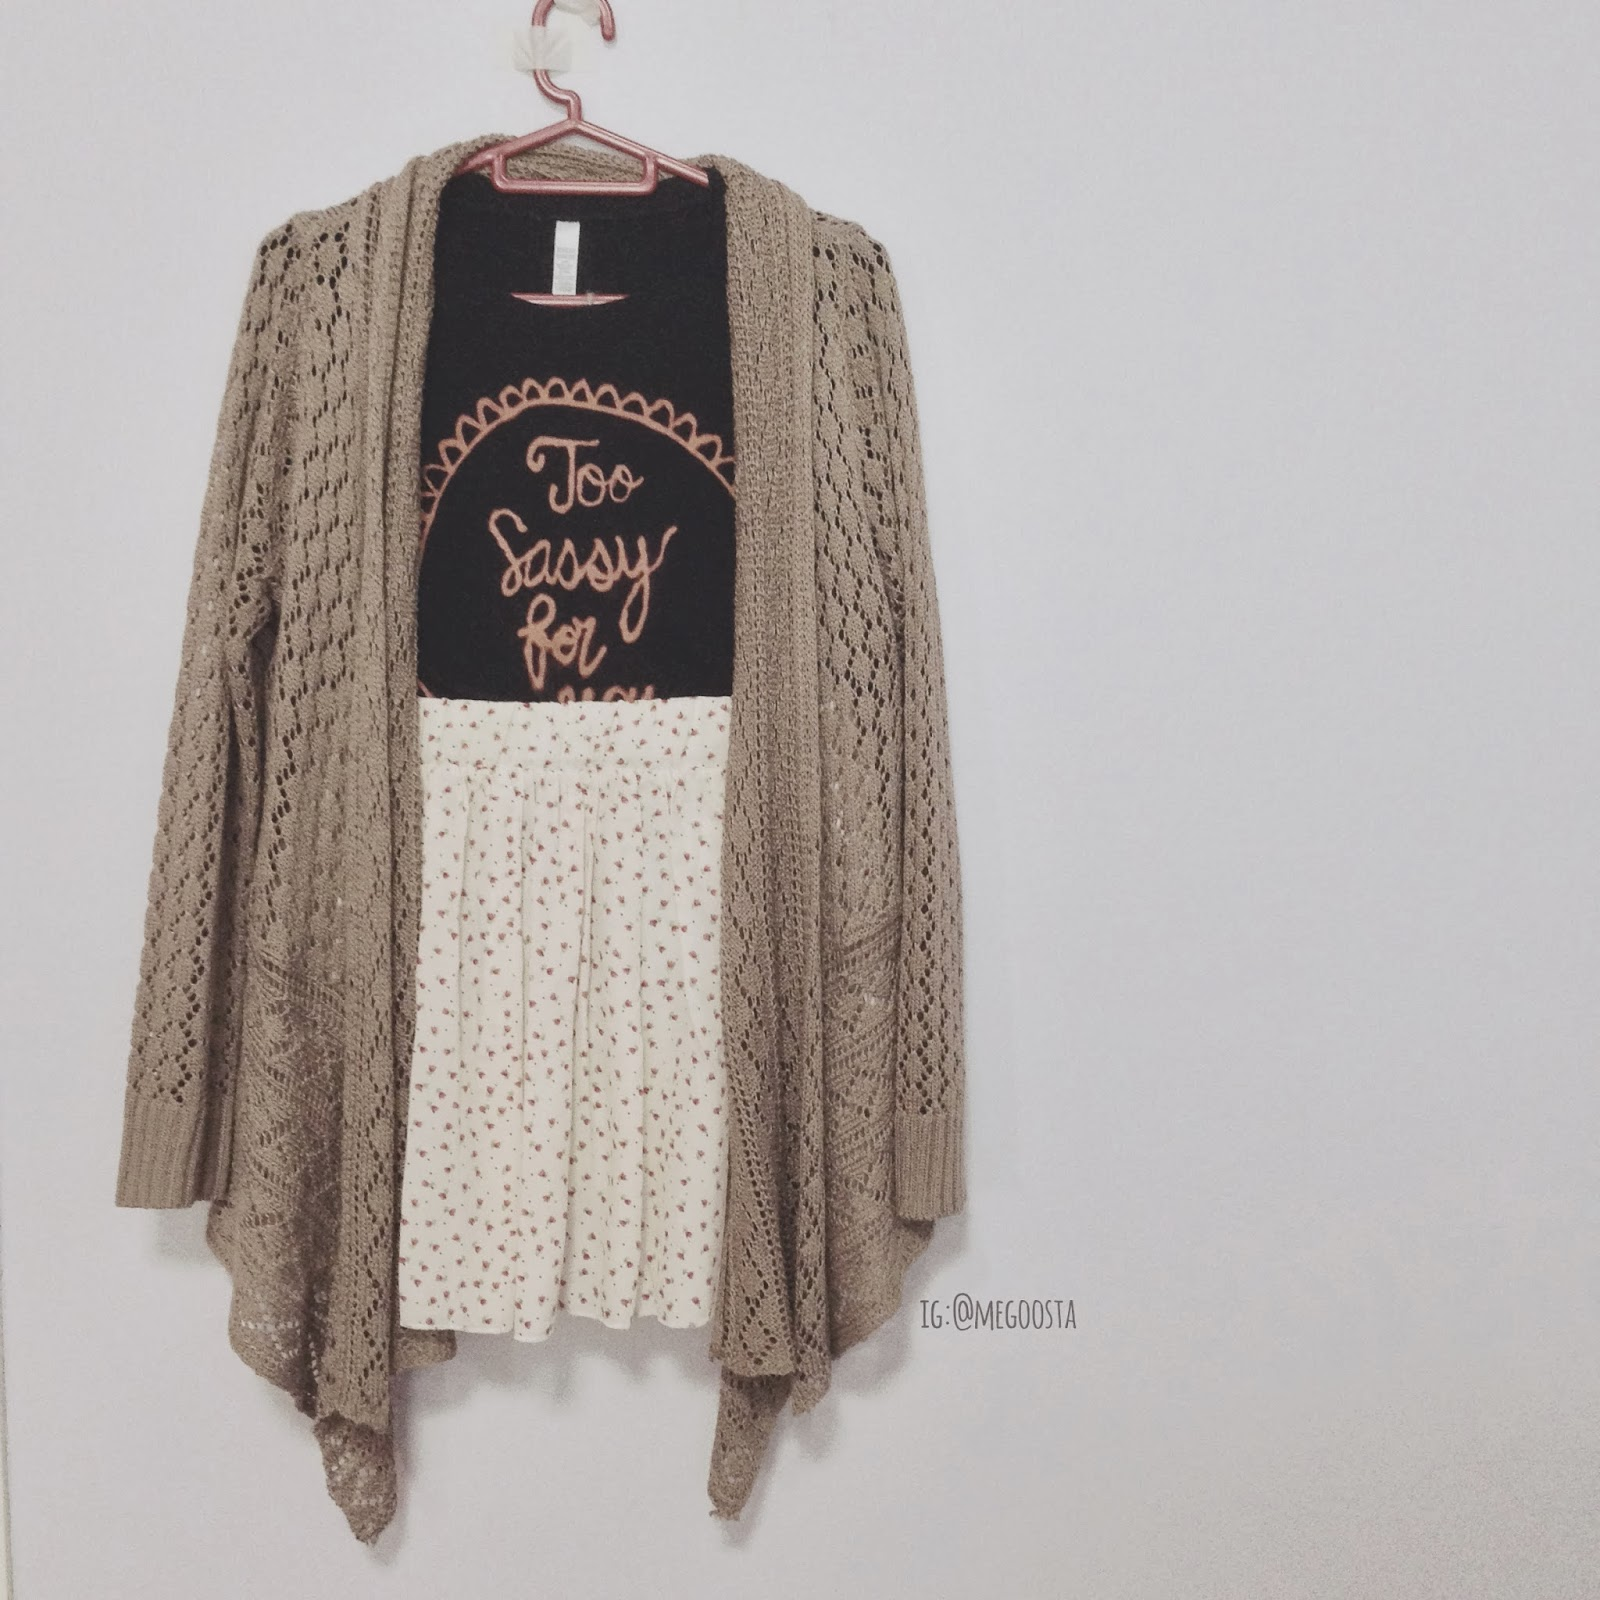 Bleaching Clothes Design | Diy Clorox Bleach Pen Shirt Design